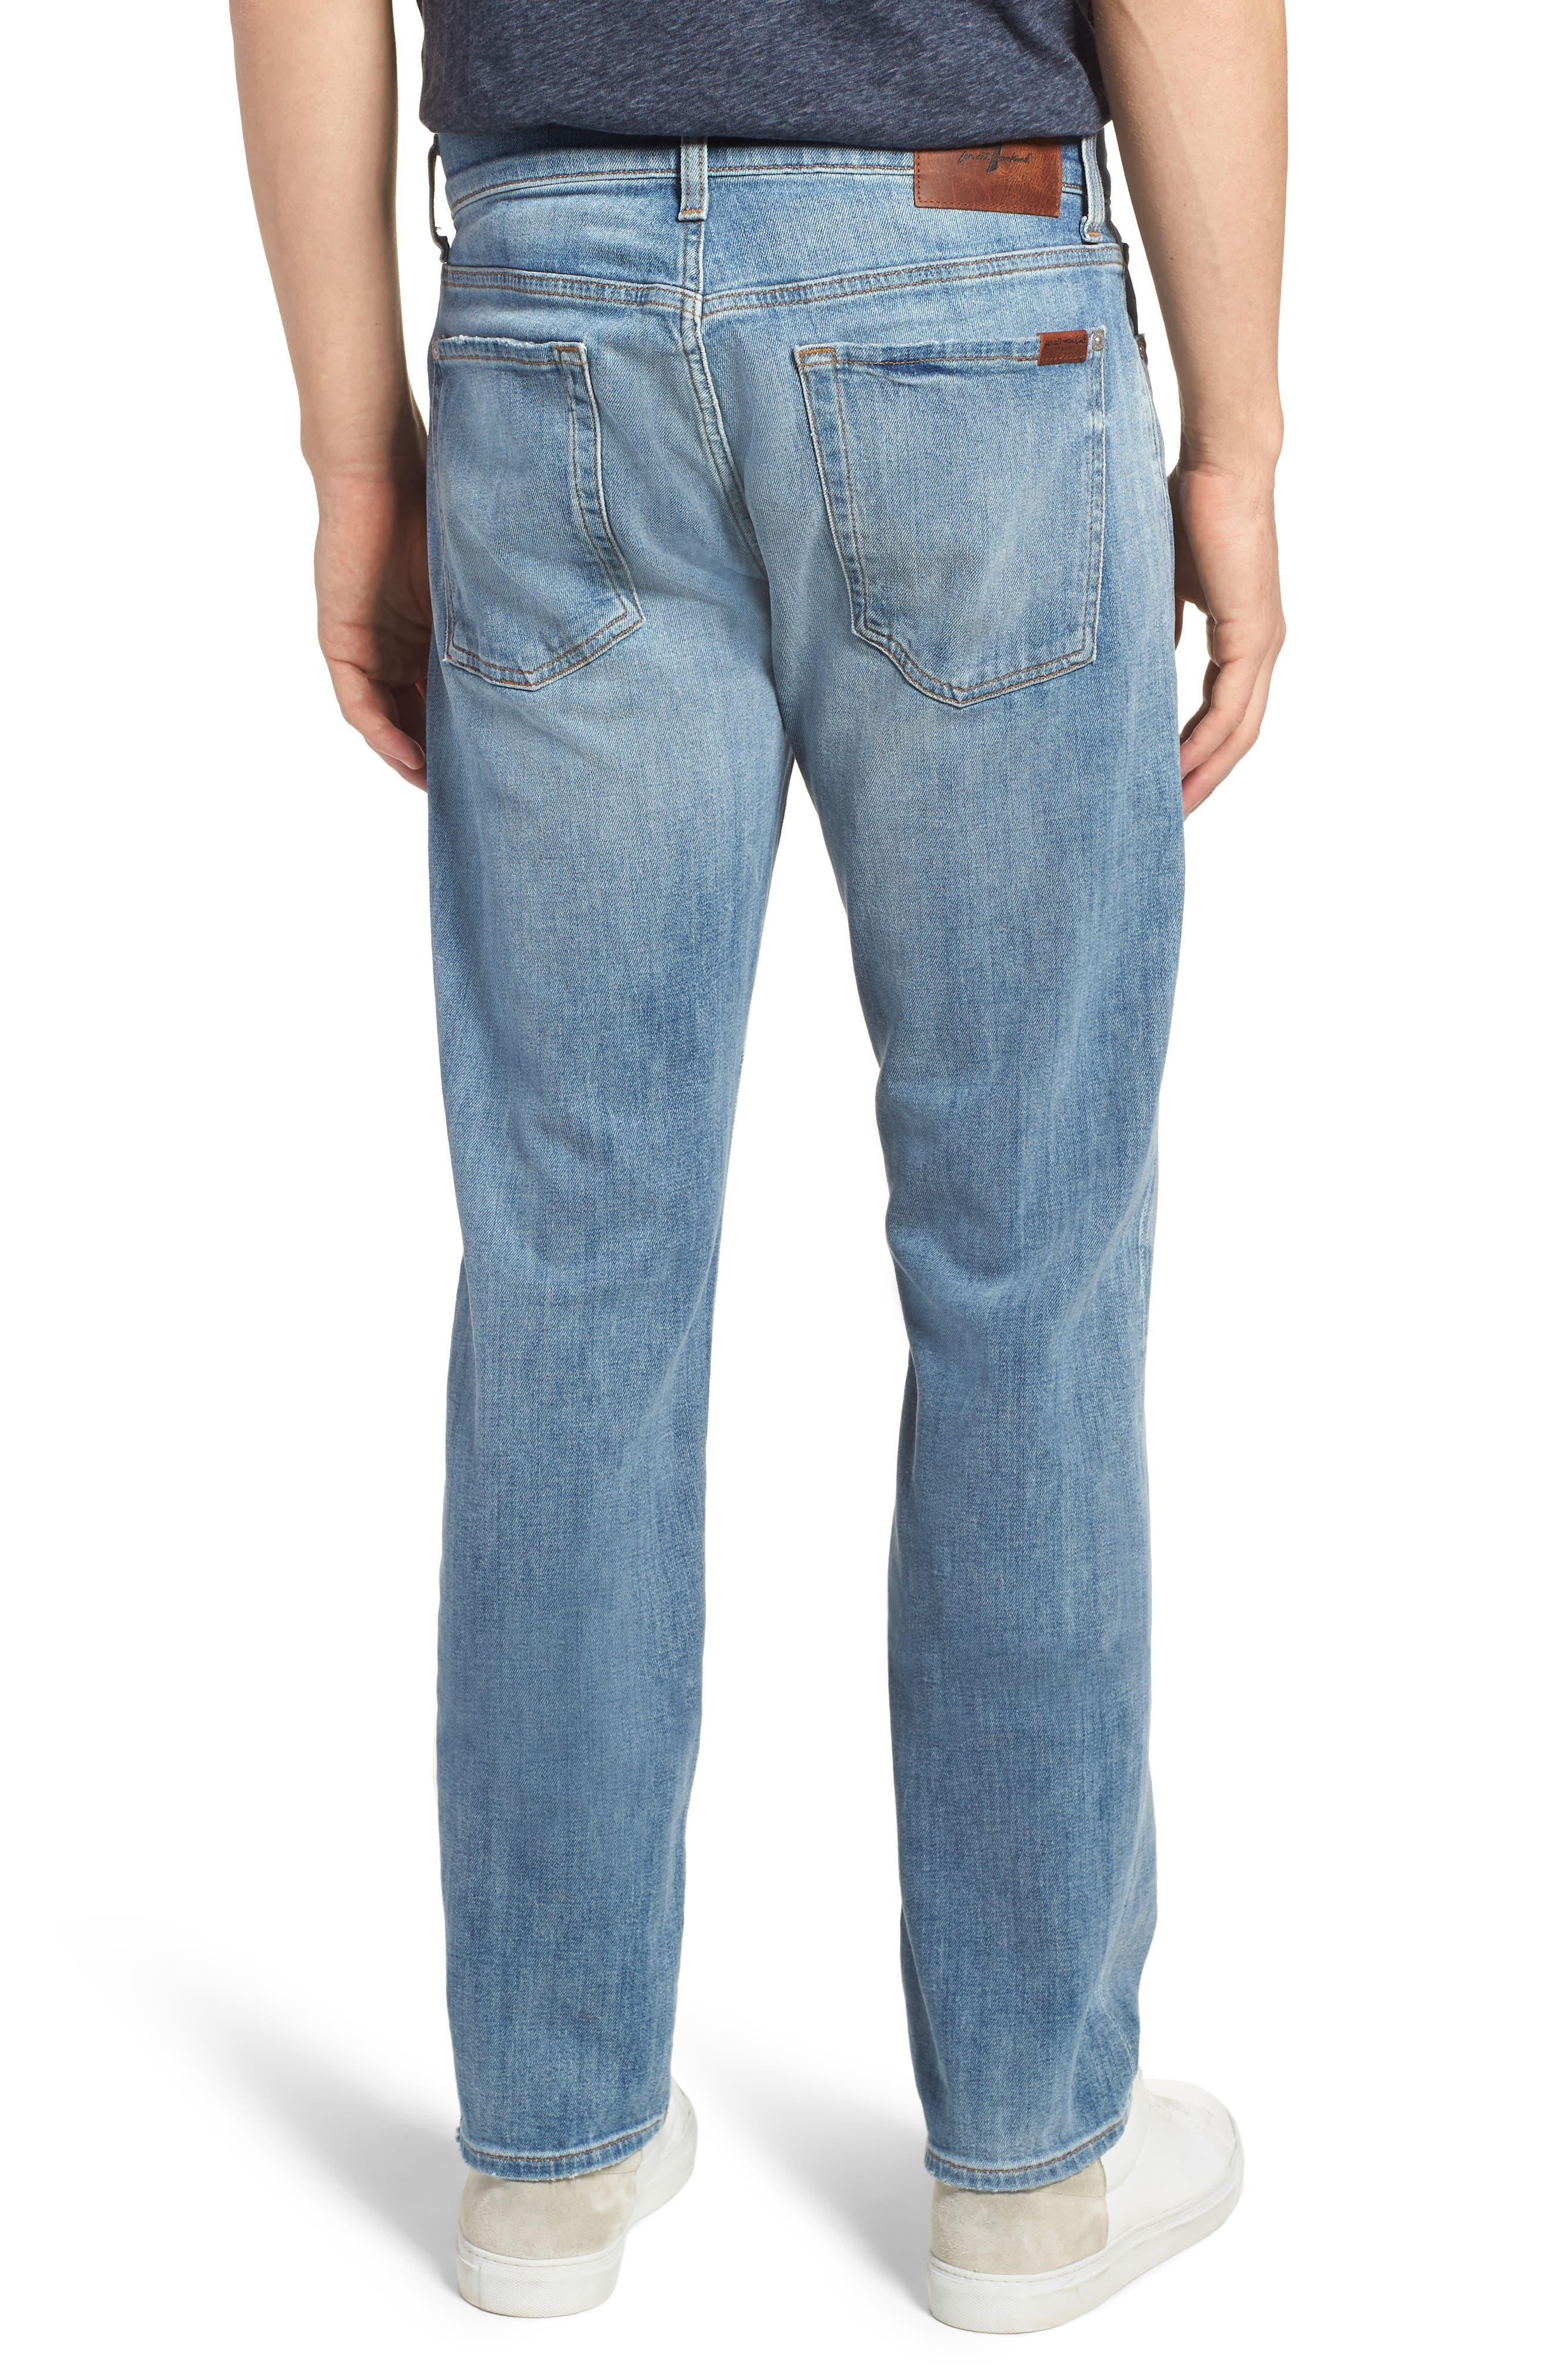 Slimmy Slim Fit Jeans,                             Alternate thumbnail 2, color,                             400